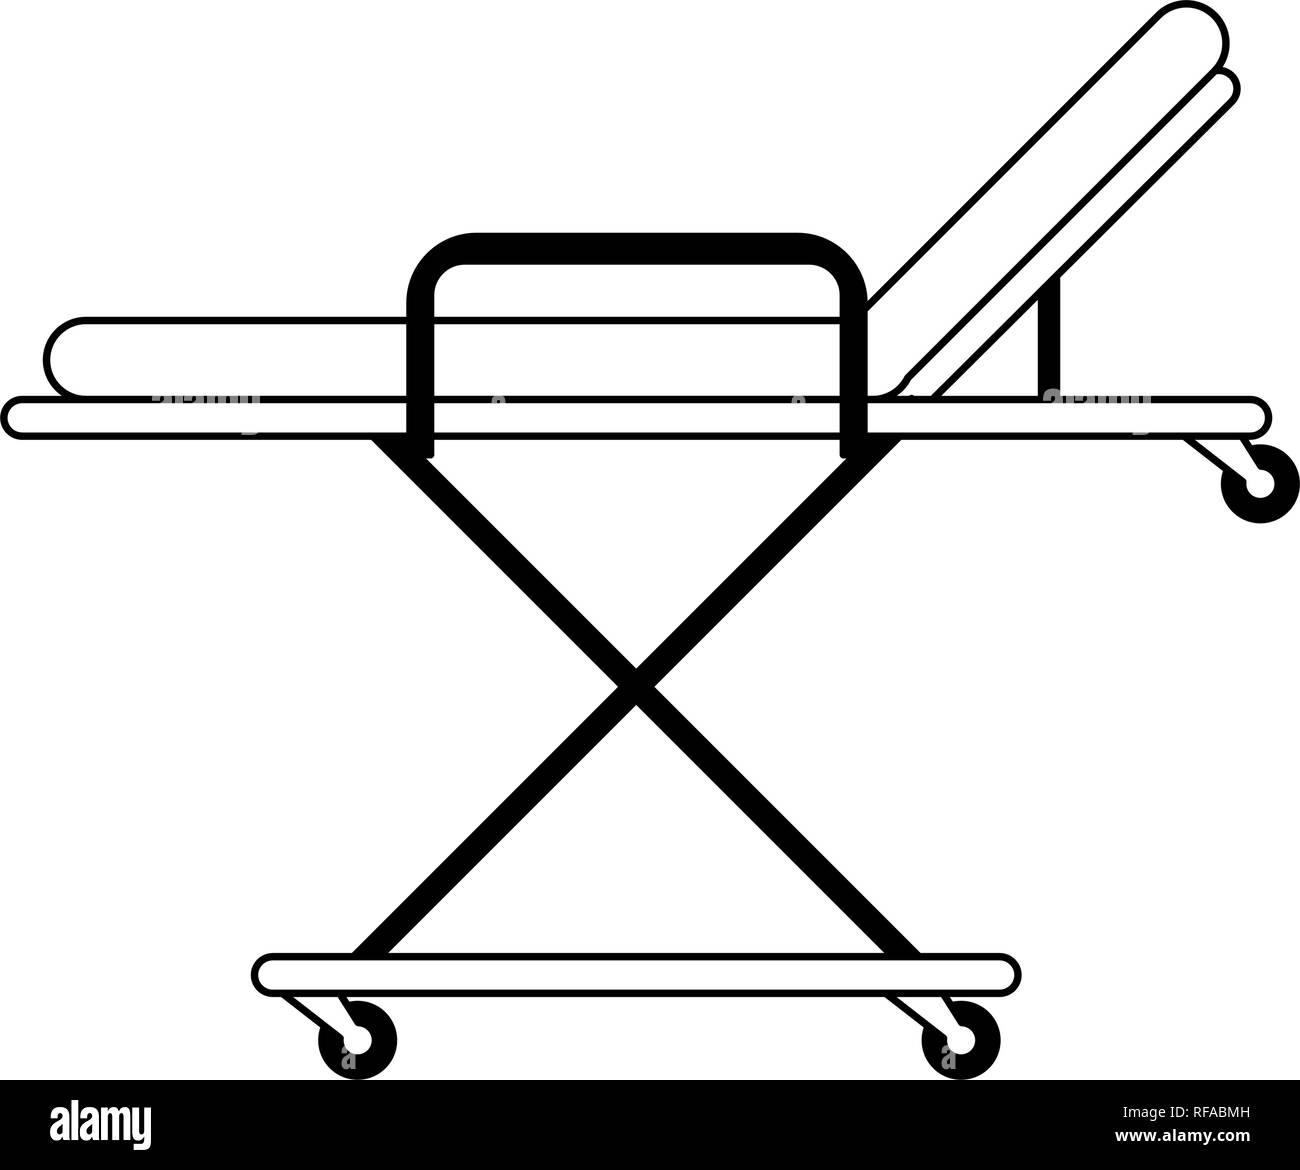 Medical stretcher symbol black and white - Stock Image